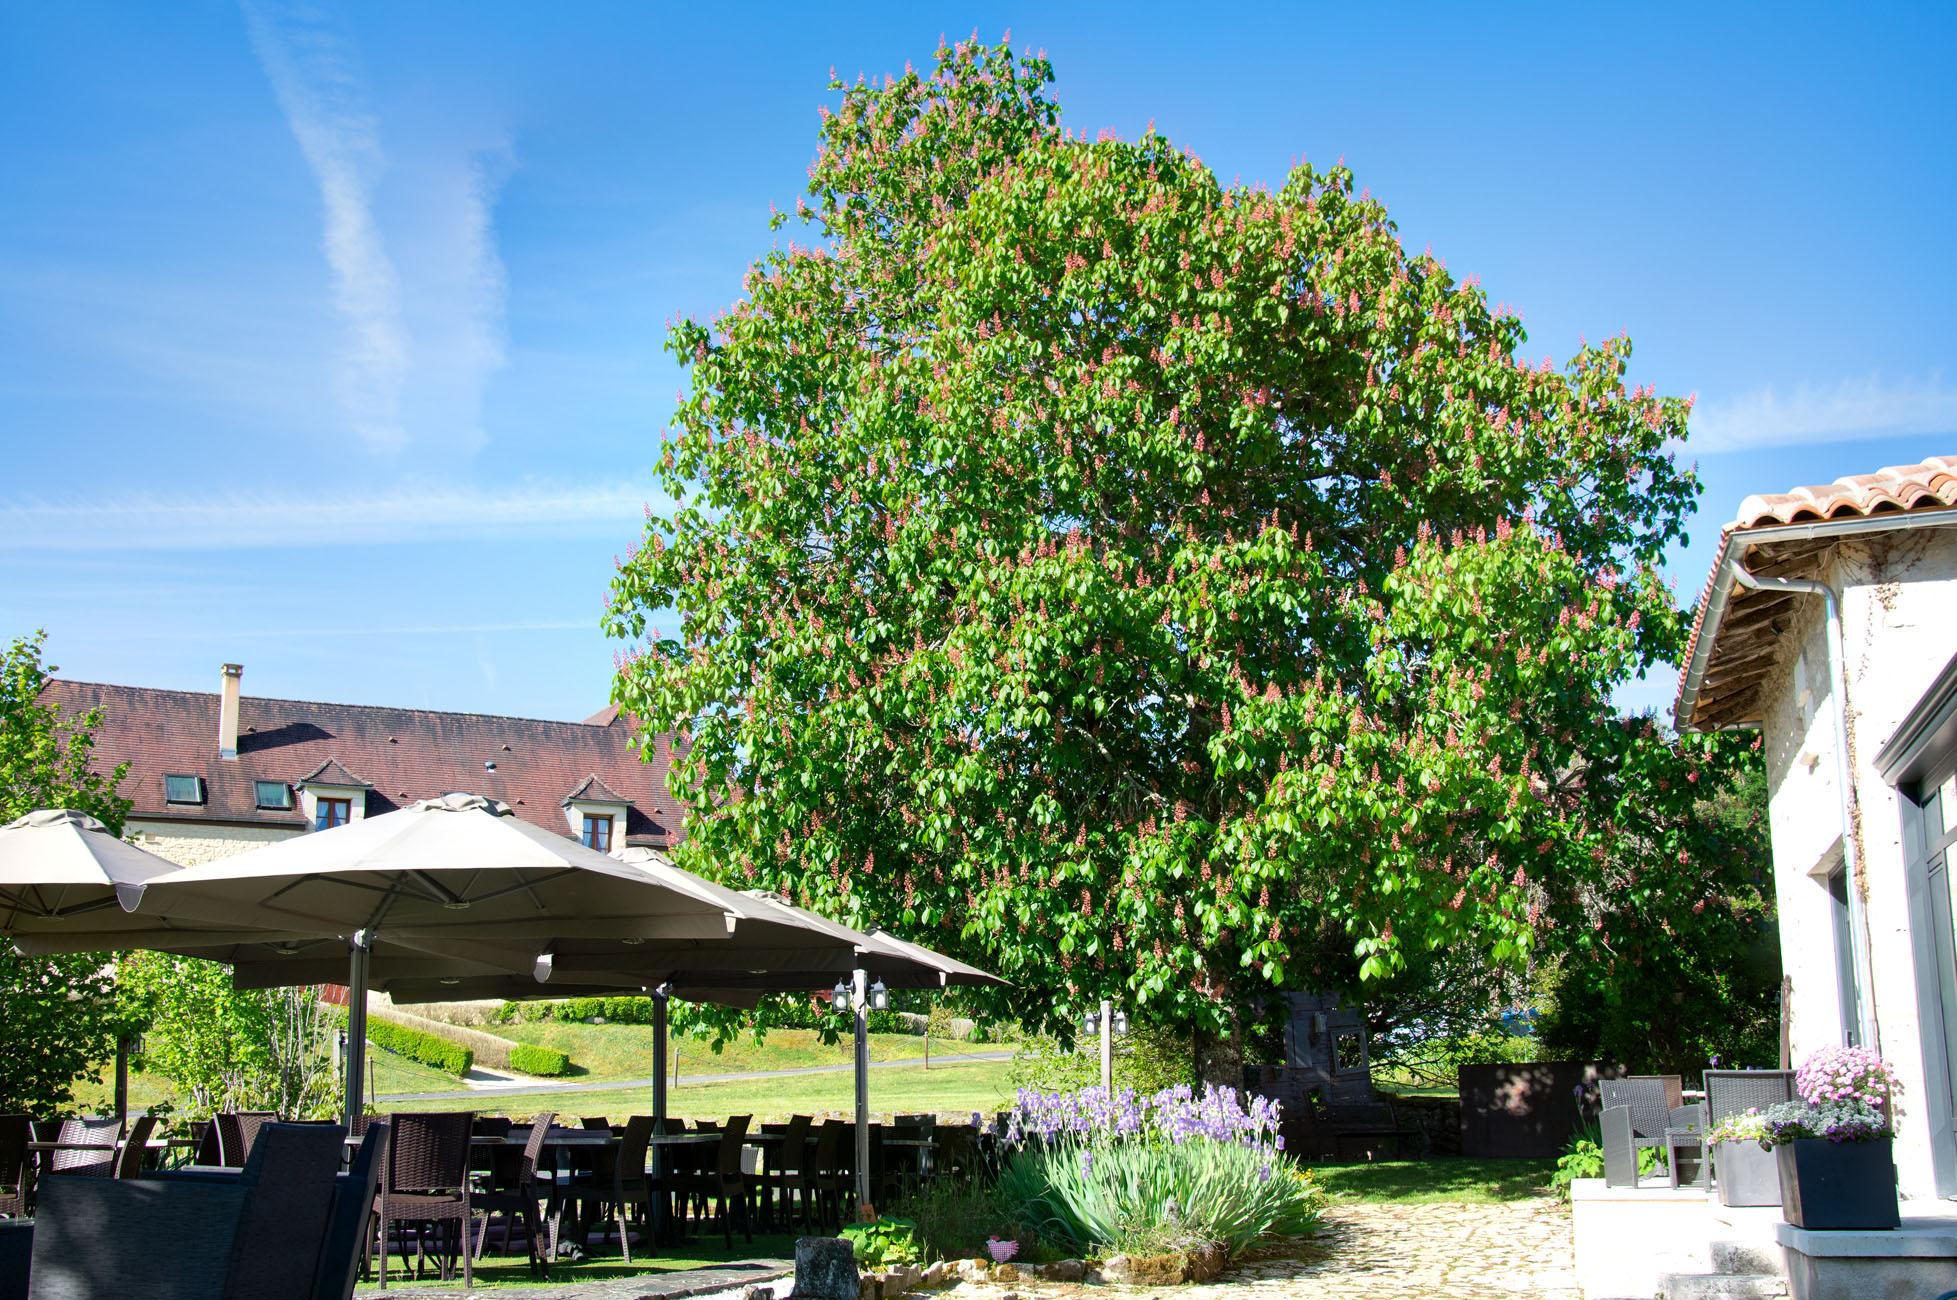 Arbre et terrasse - Tree and terrasse